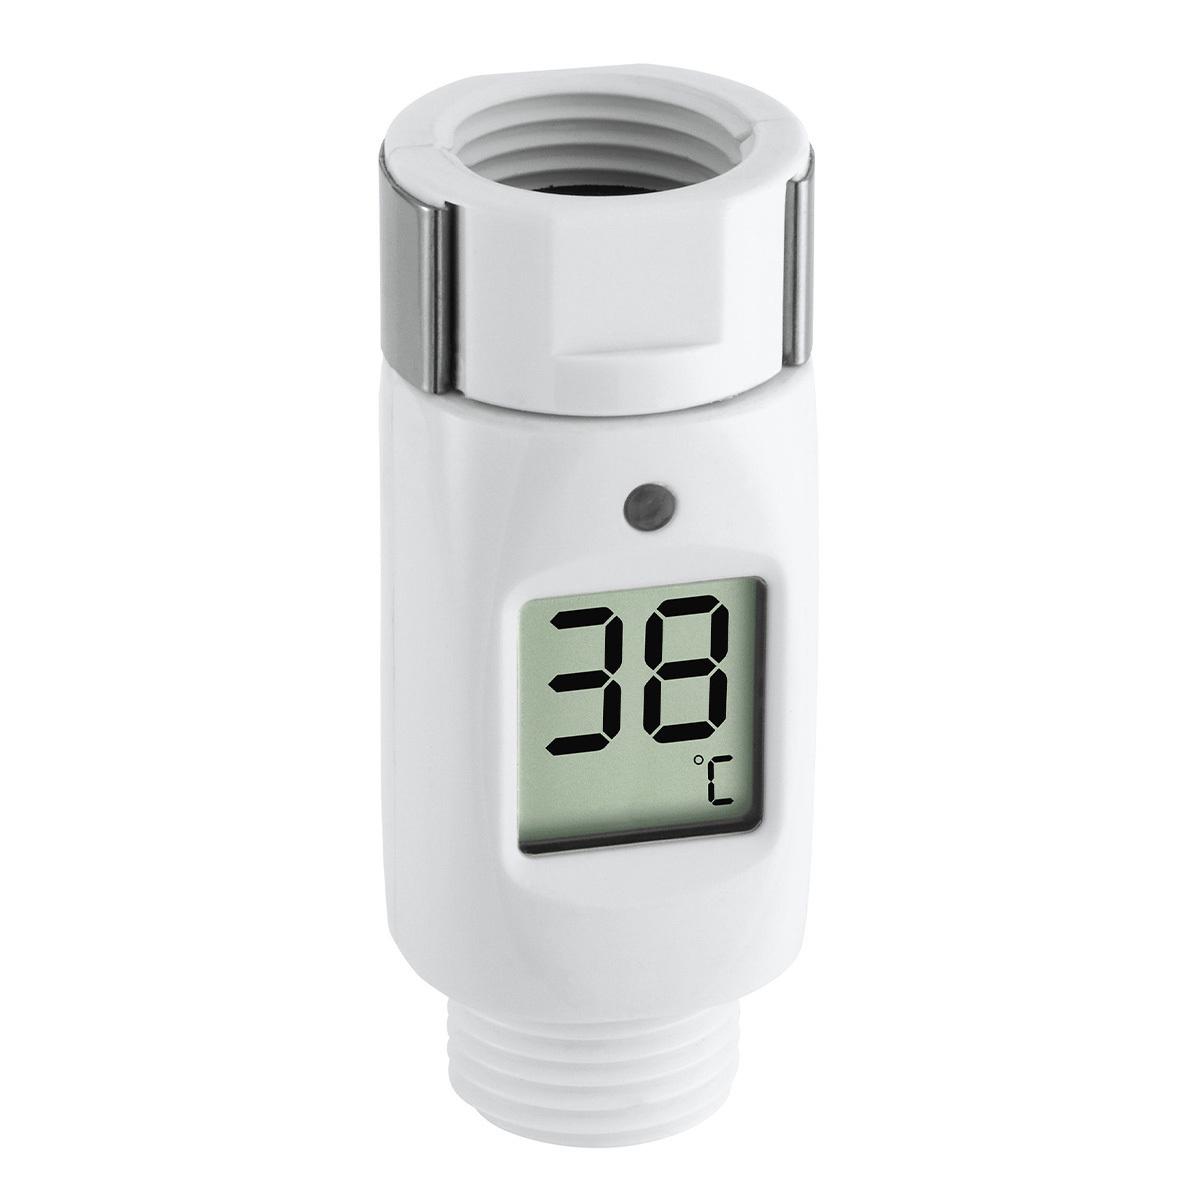 30-1046-digitales-duschthermometer-1200x1200px.jpg